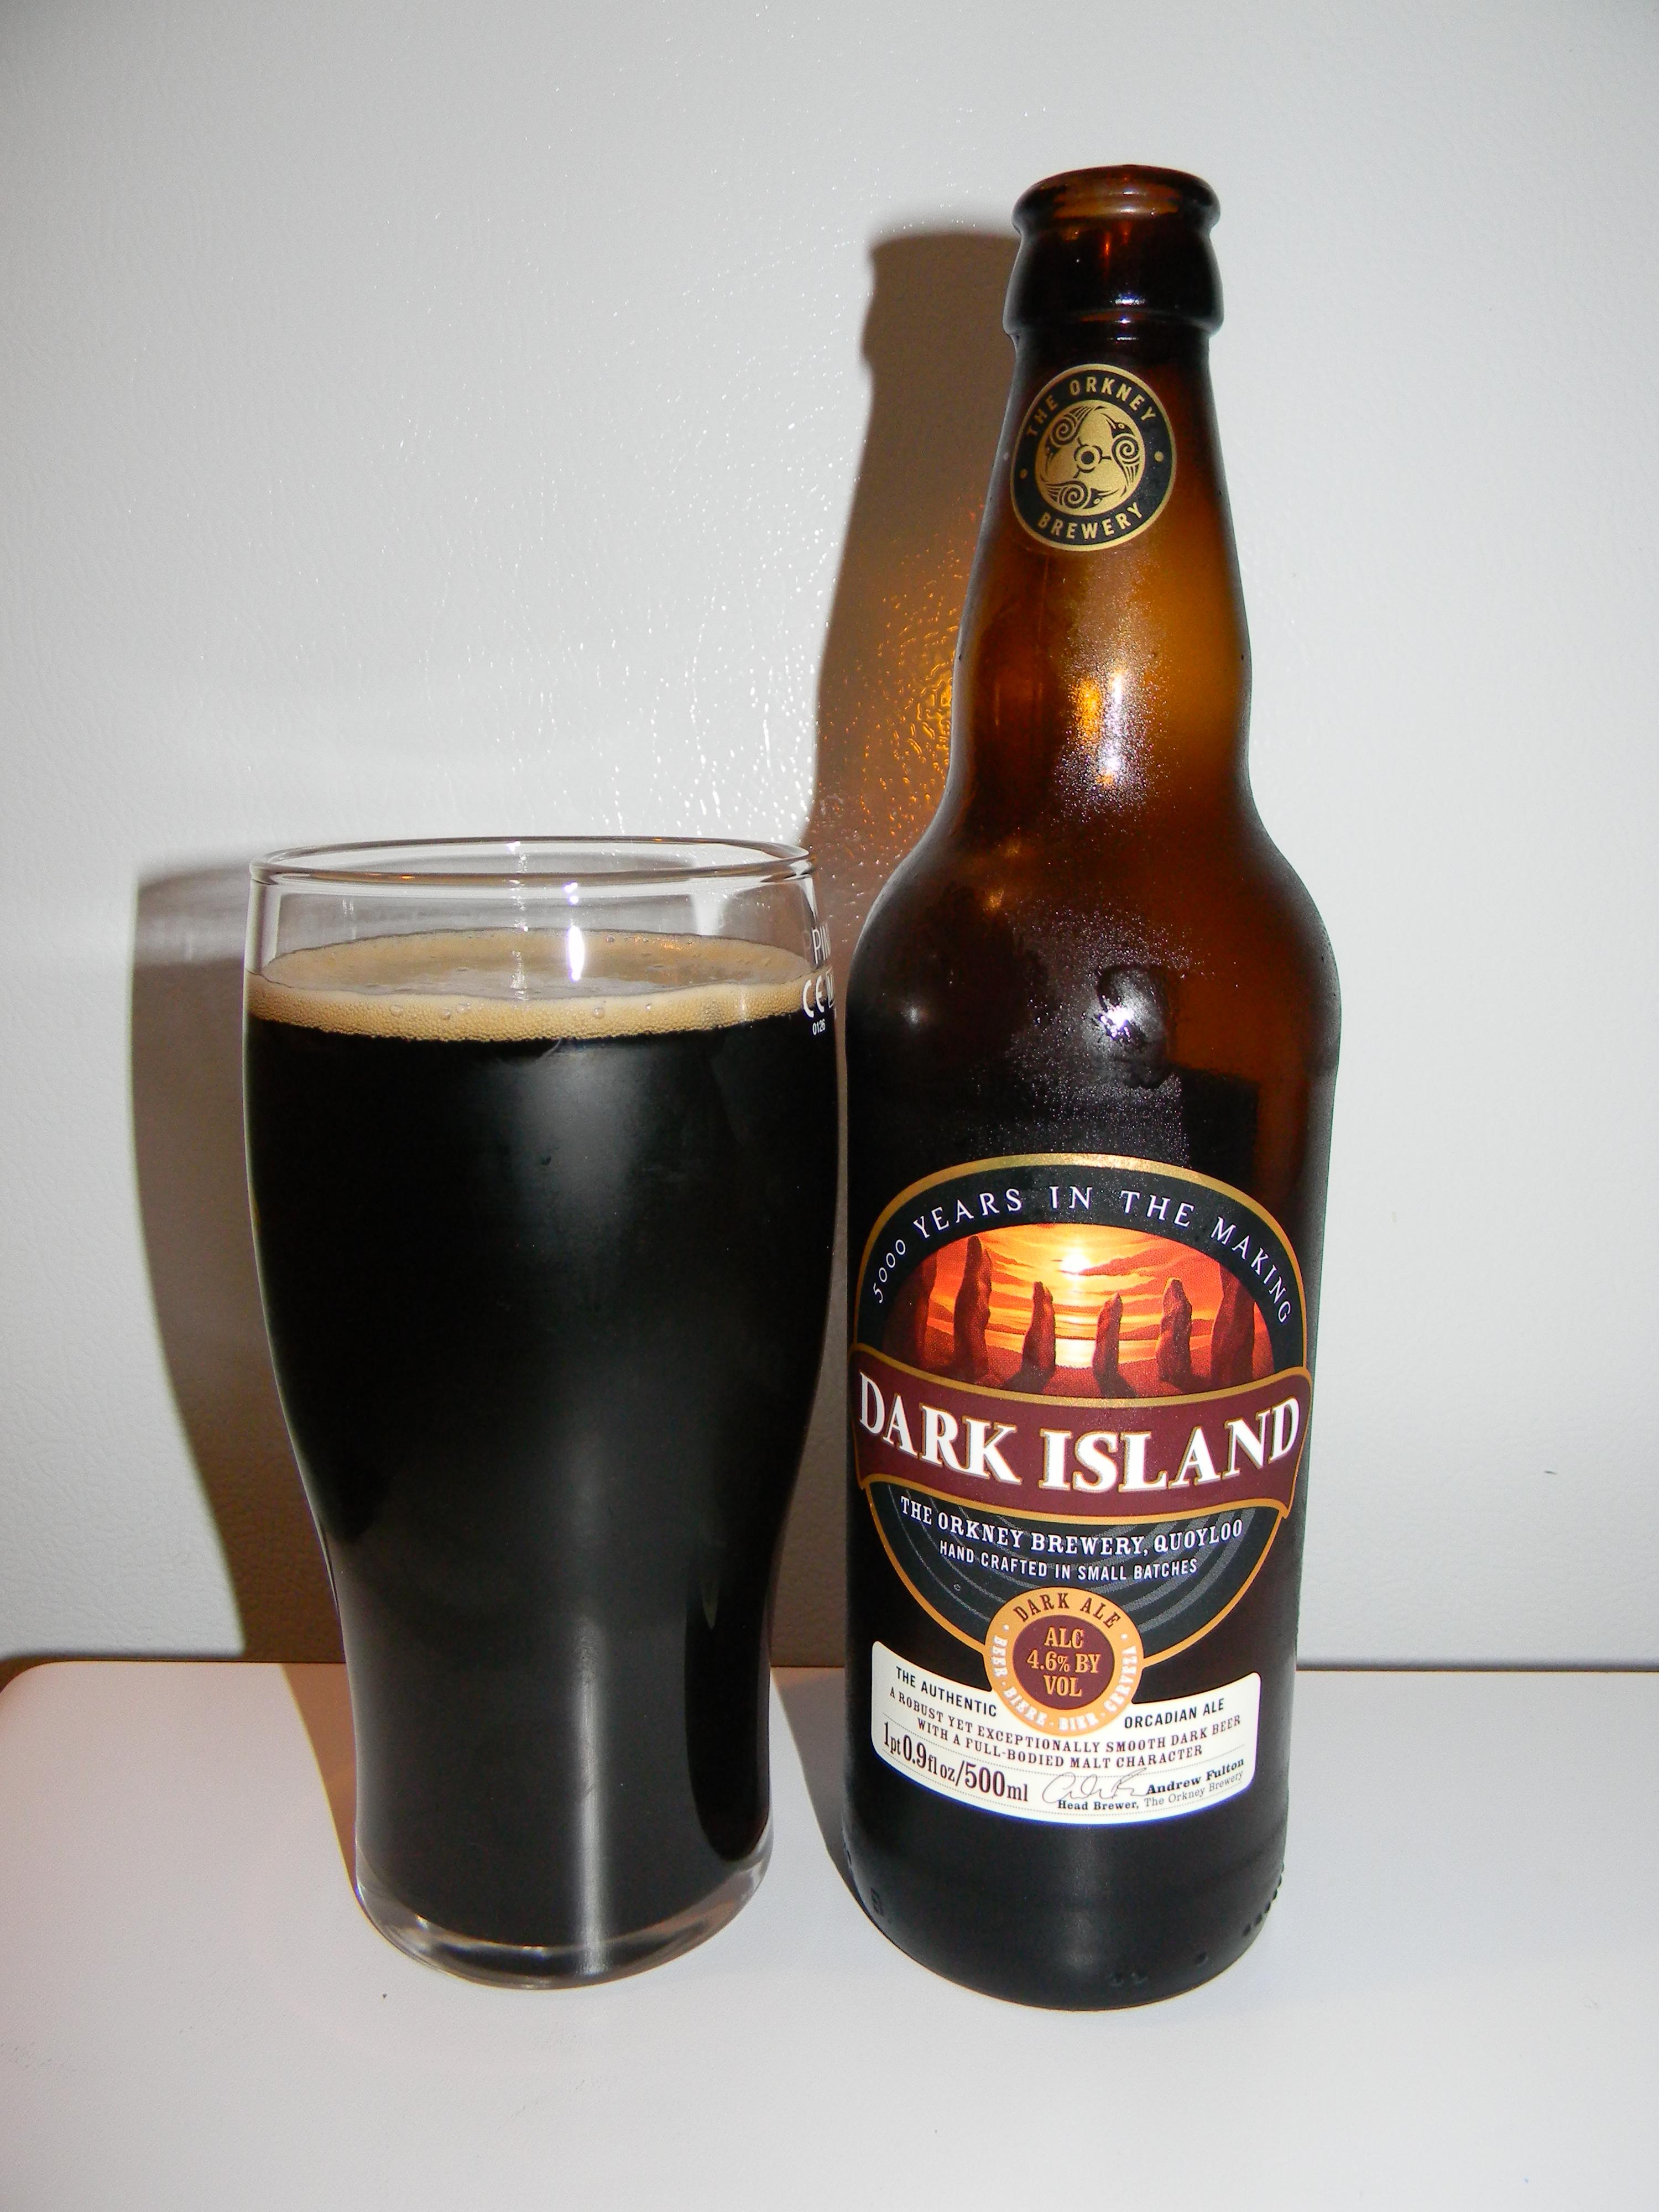 Orkney Brewery Dark Island birra recensione diario birroso blog birra artigianale